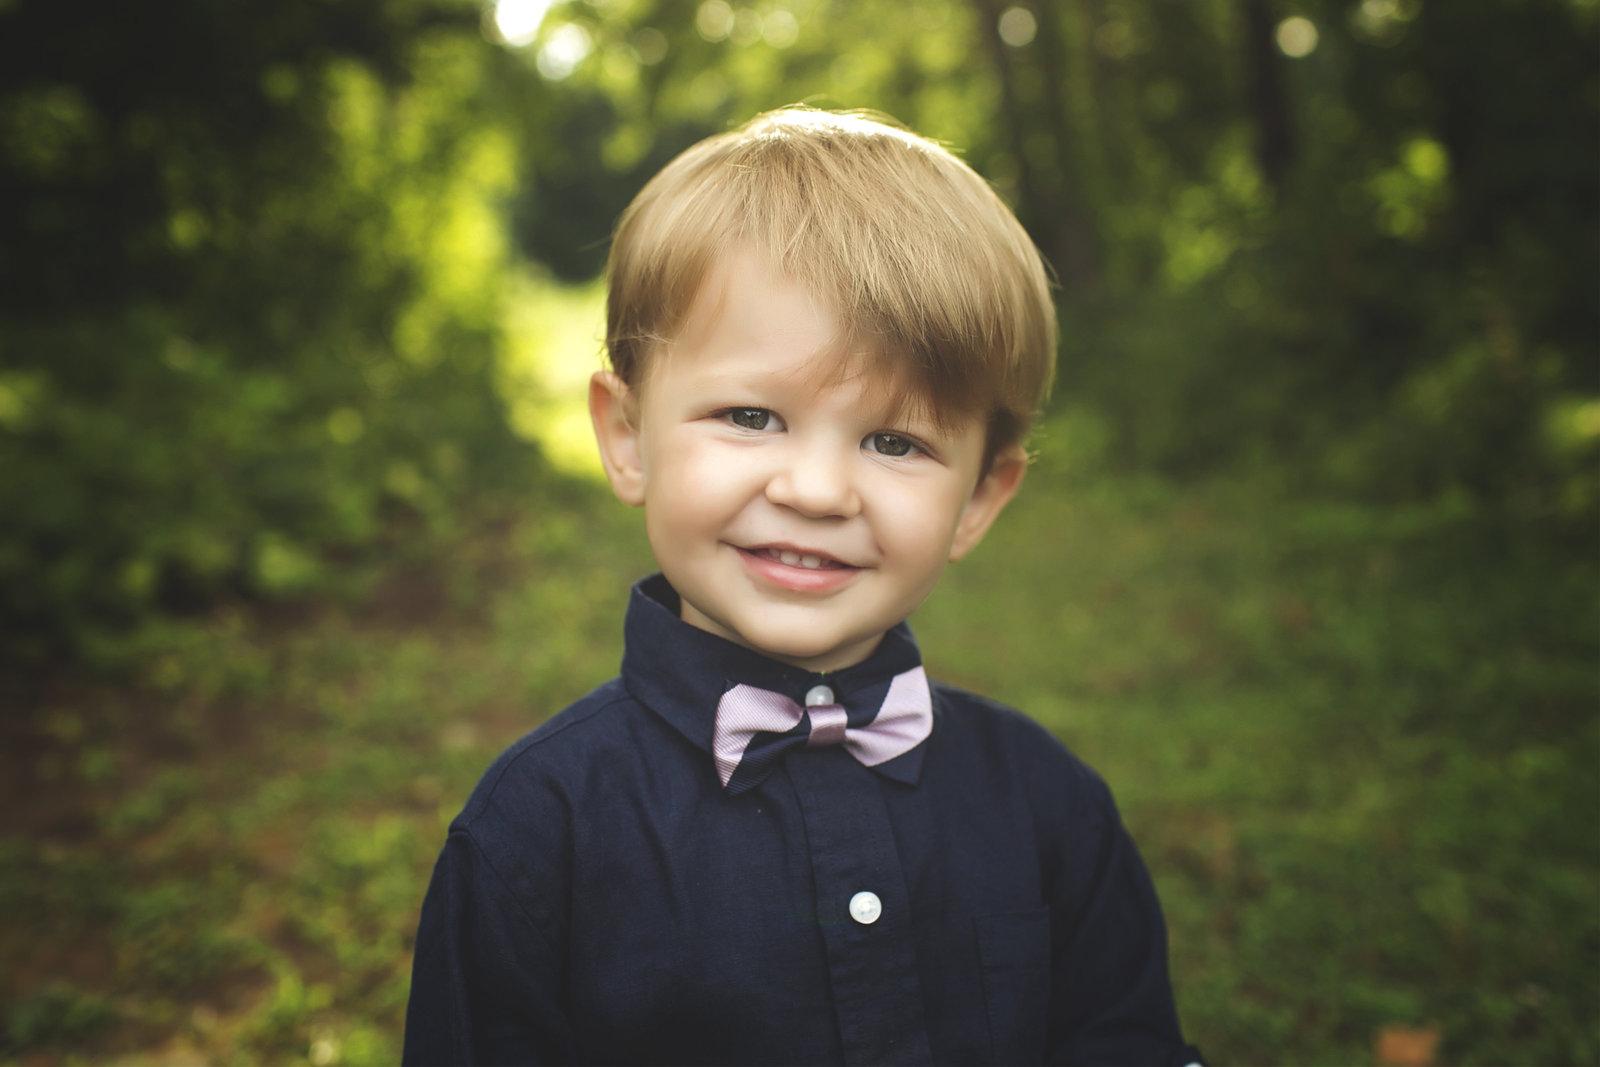 Rochester Children's photographer